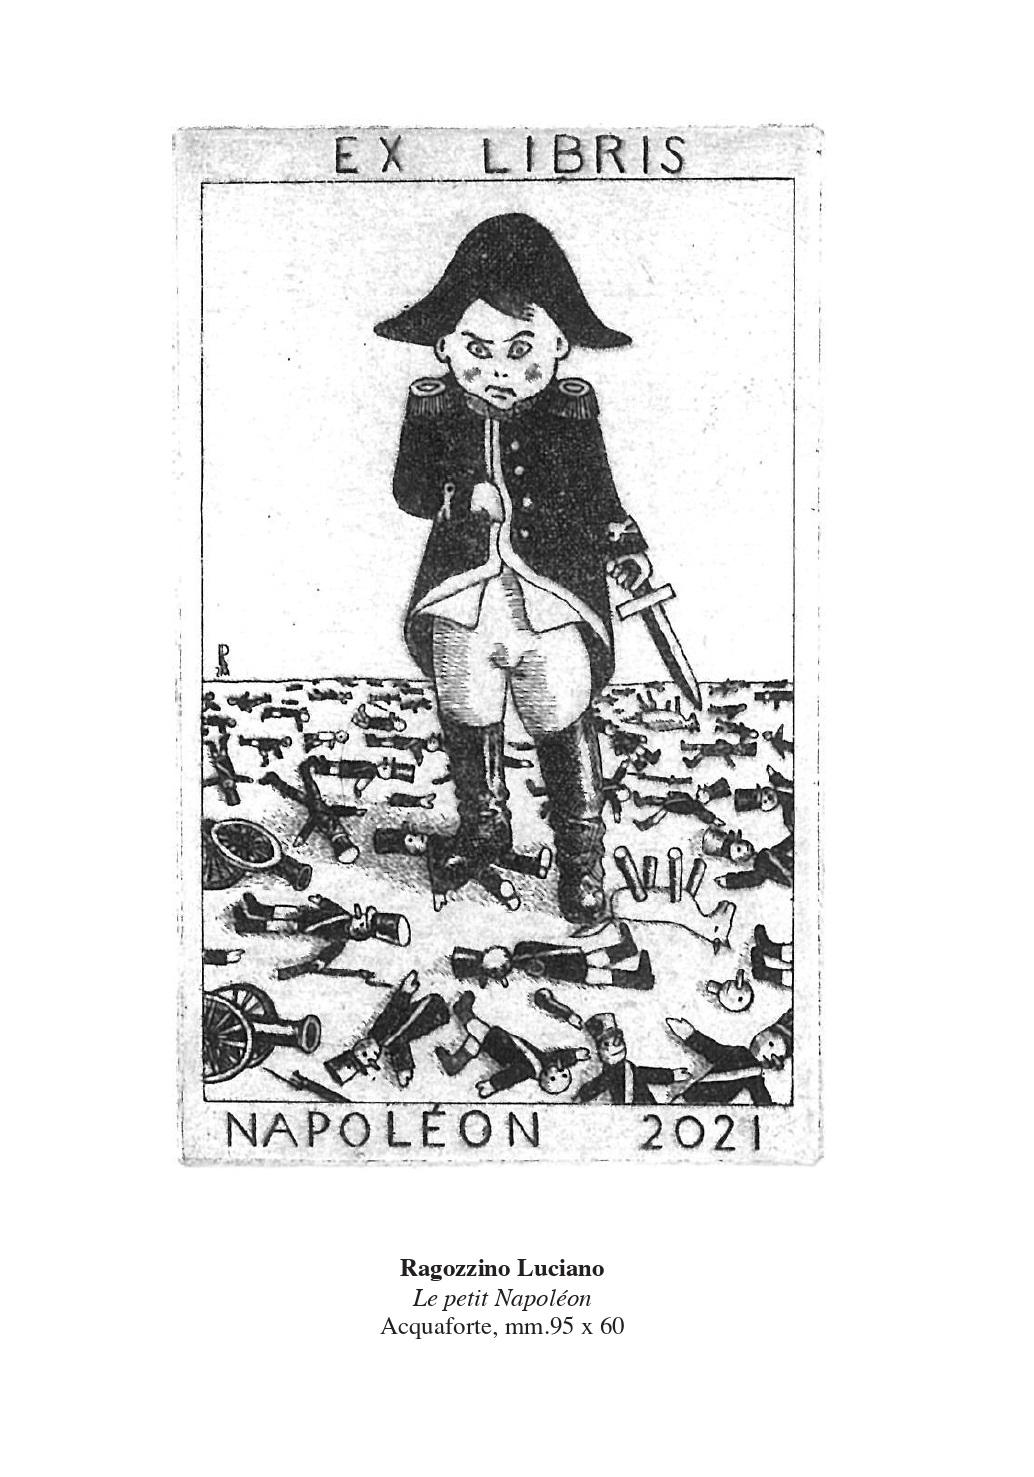 CATALOGO exlibris 2021-125_page-0001